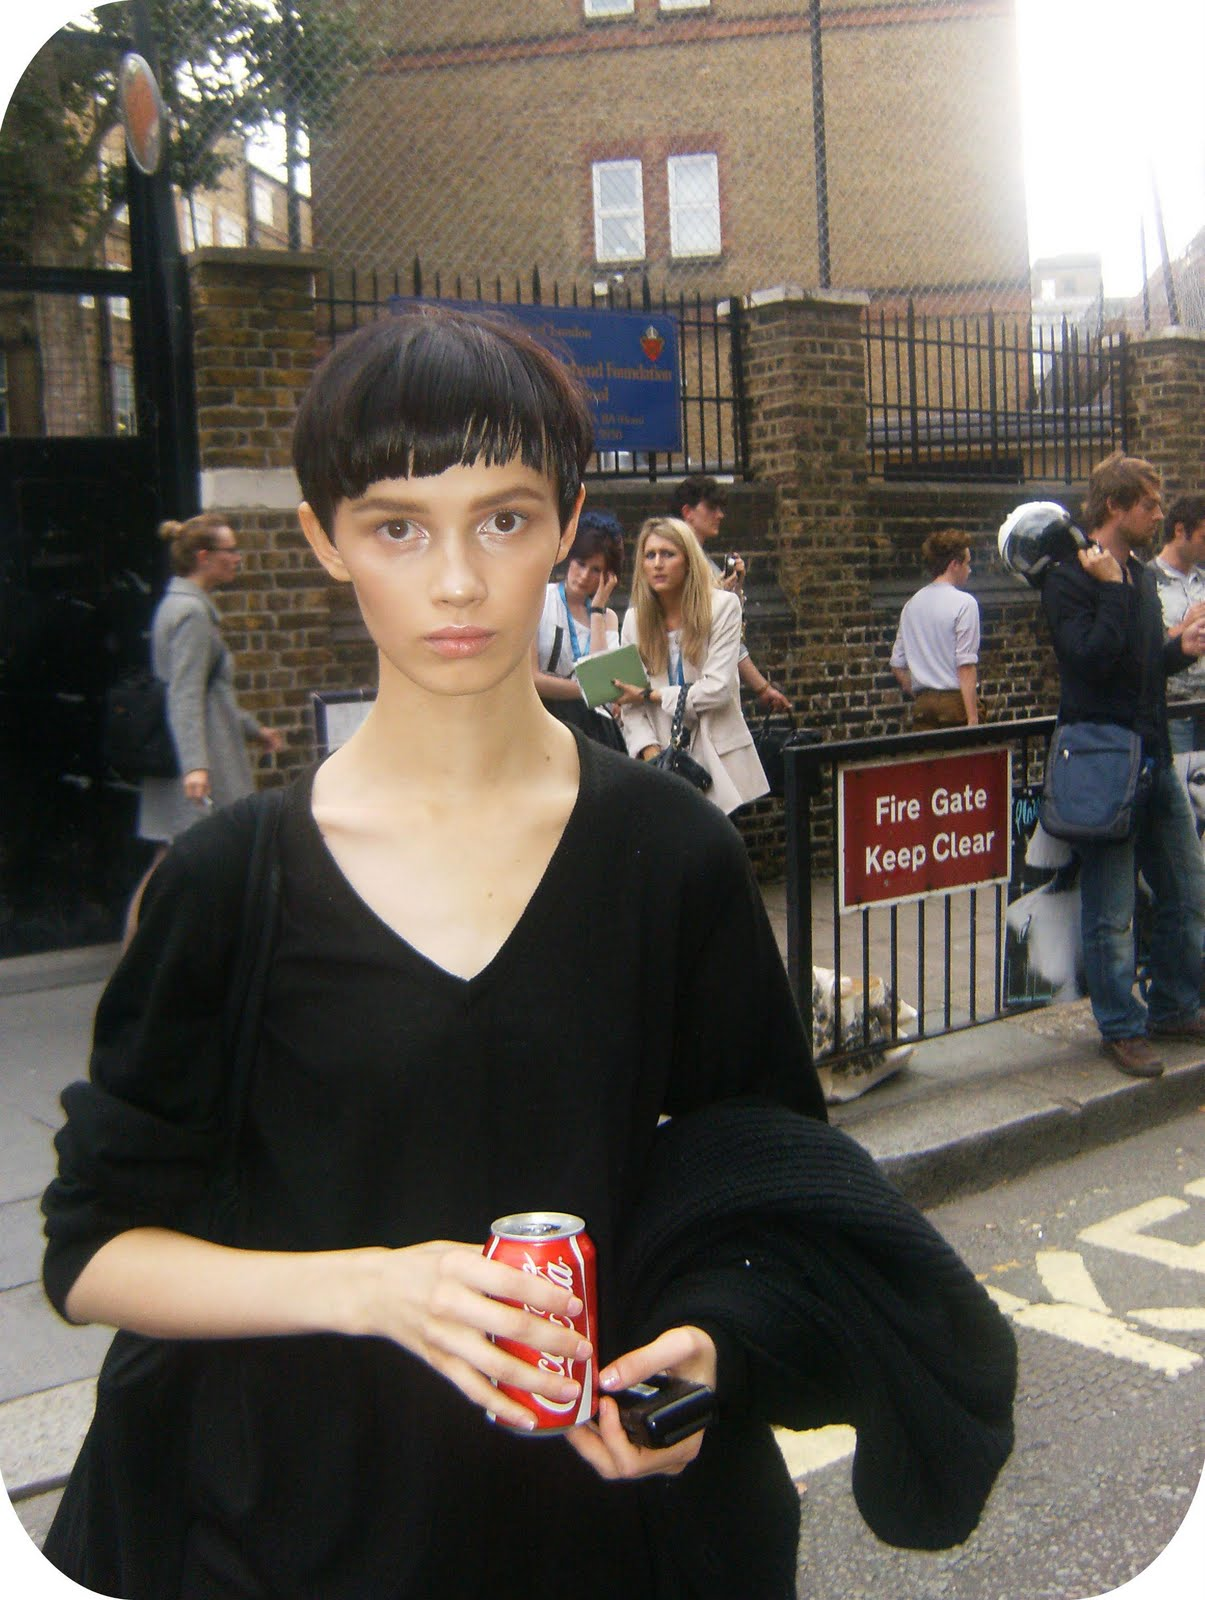 Pictures Lena Headey nude (18 photo), Pussy, Paparazzi, Selfie, braless 2006